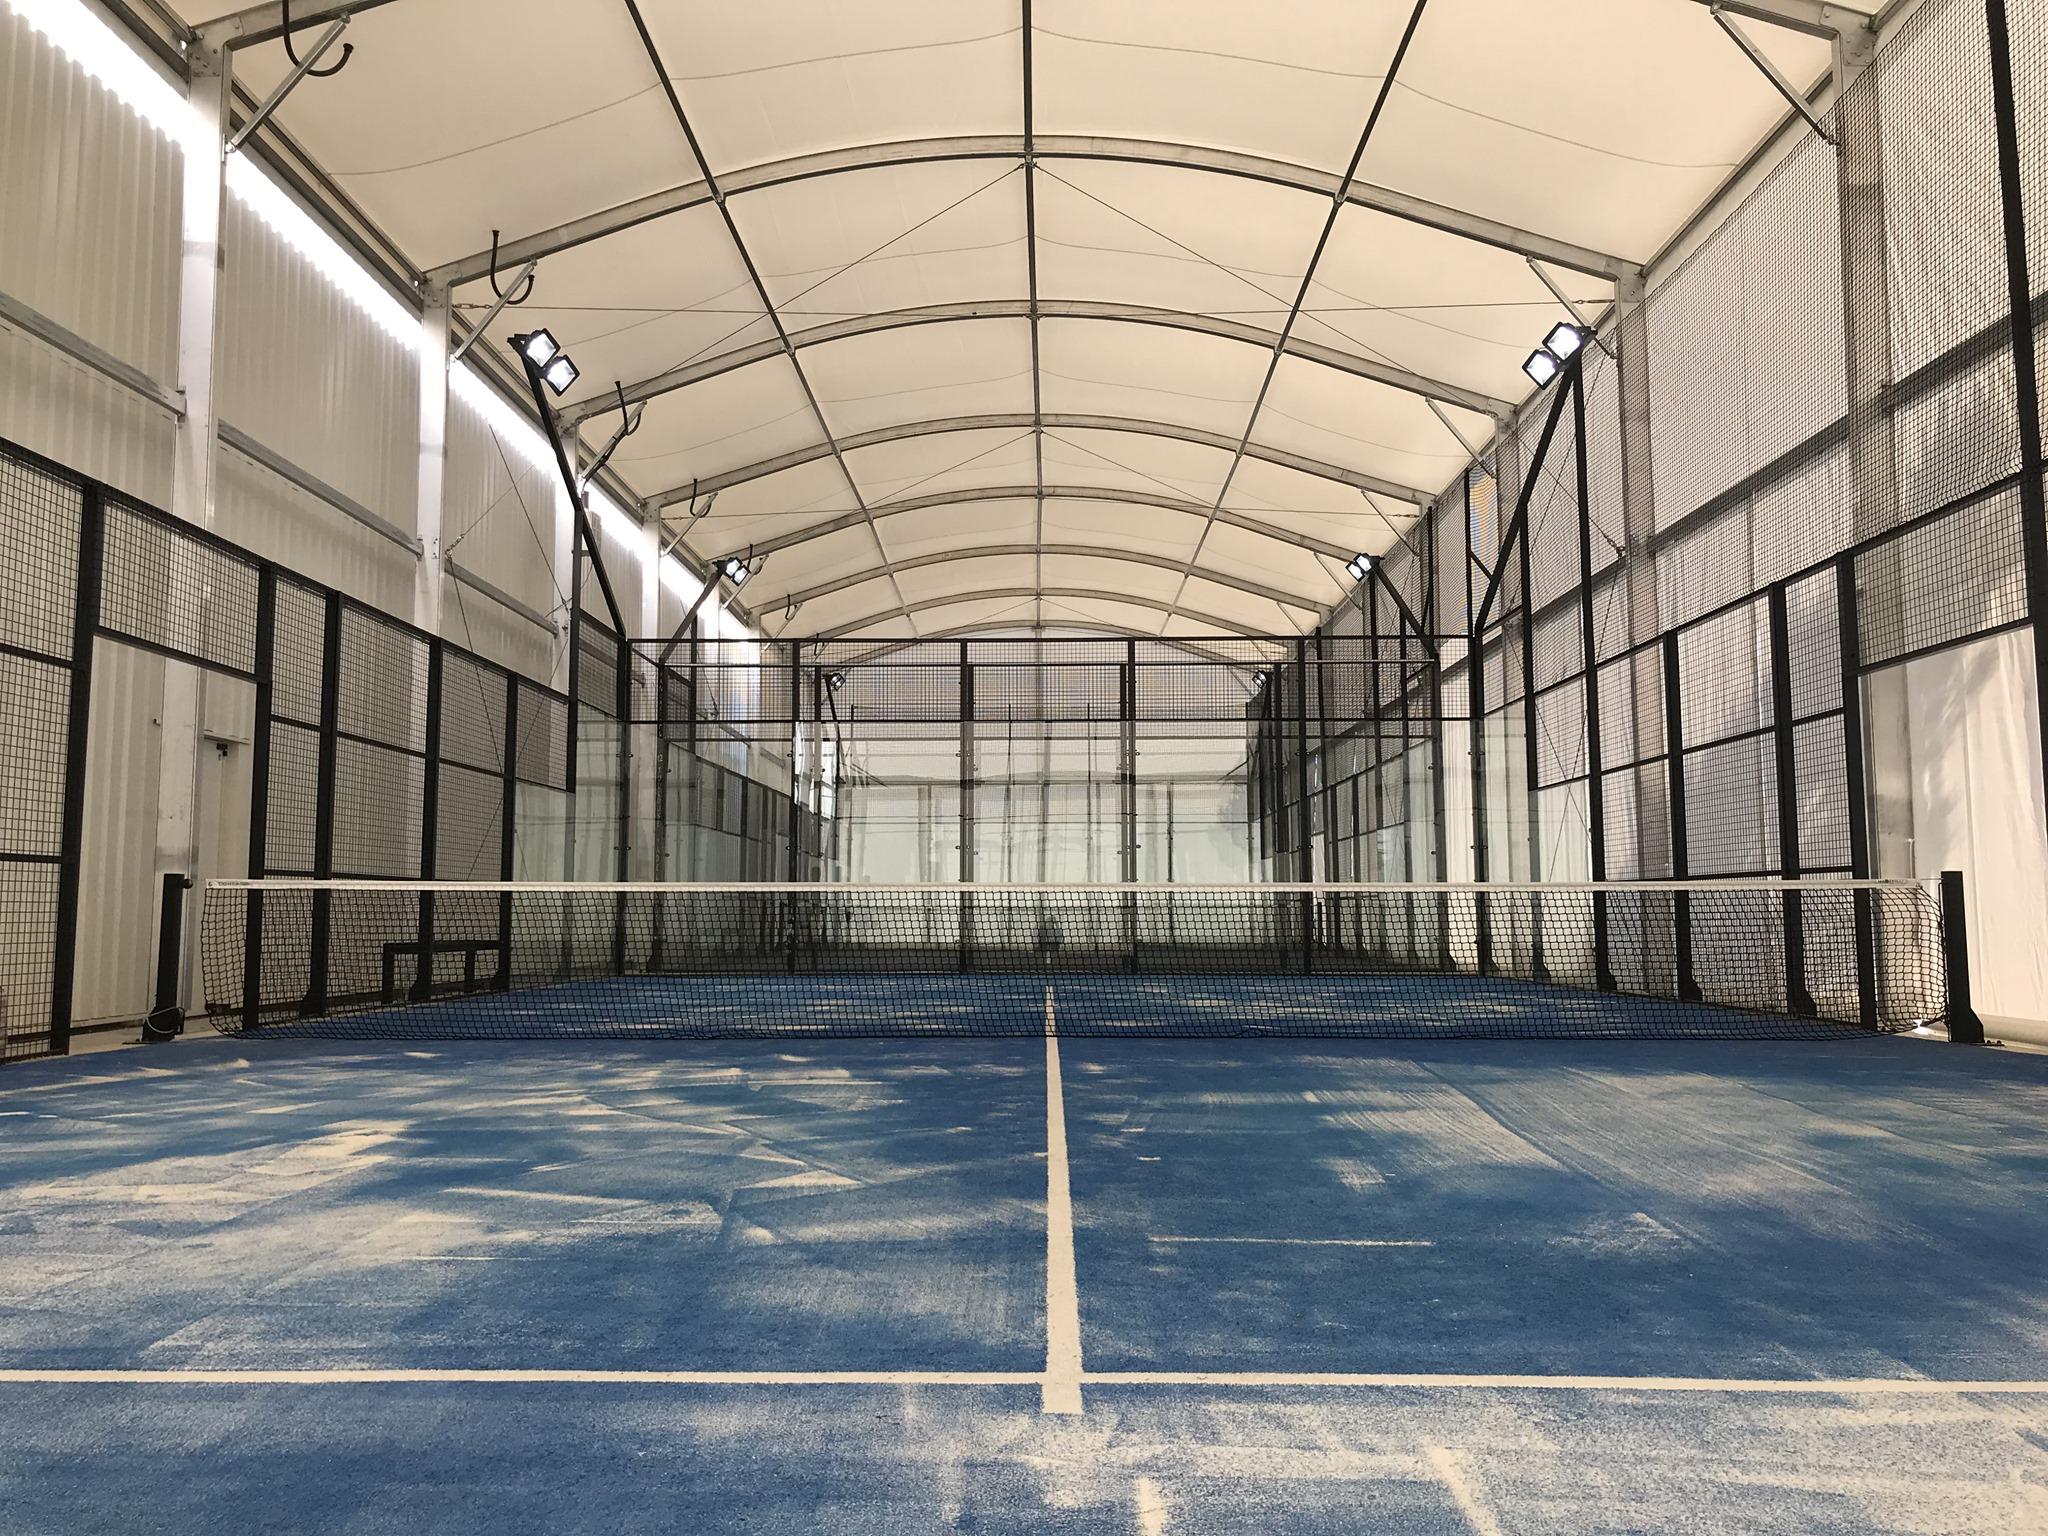 Toulouse Padel Club : 12 terrains couverts